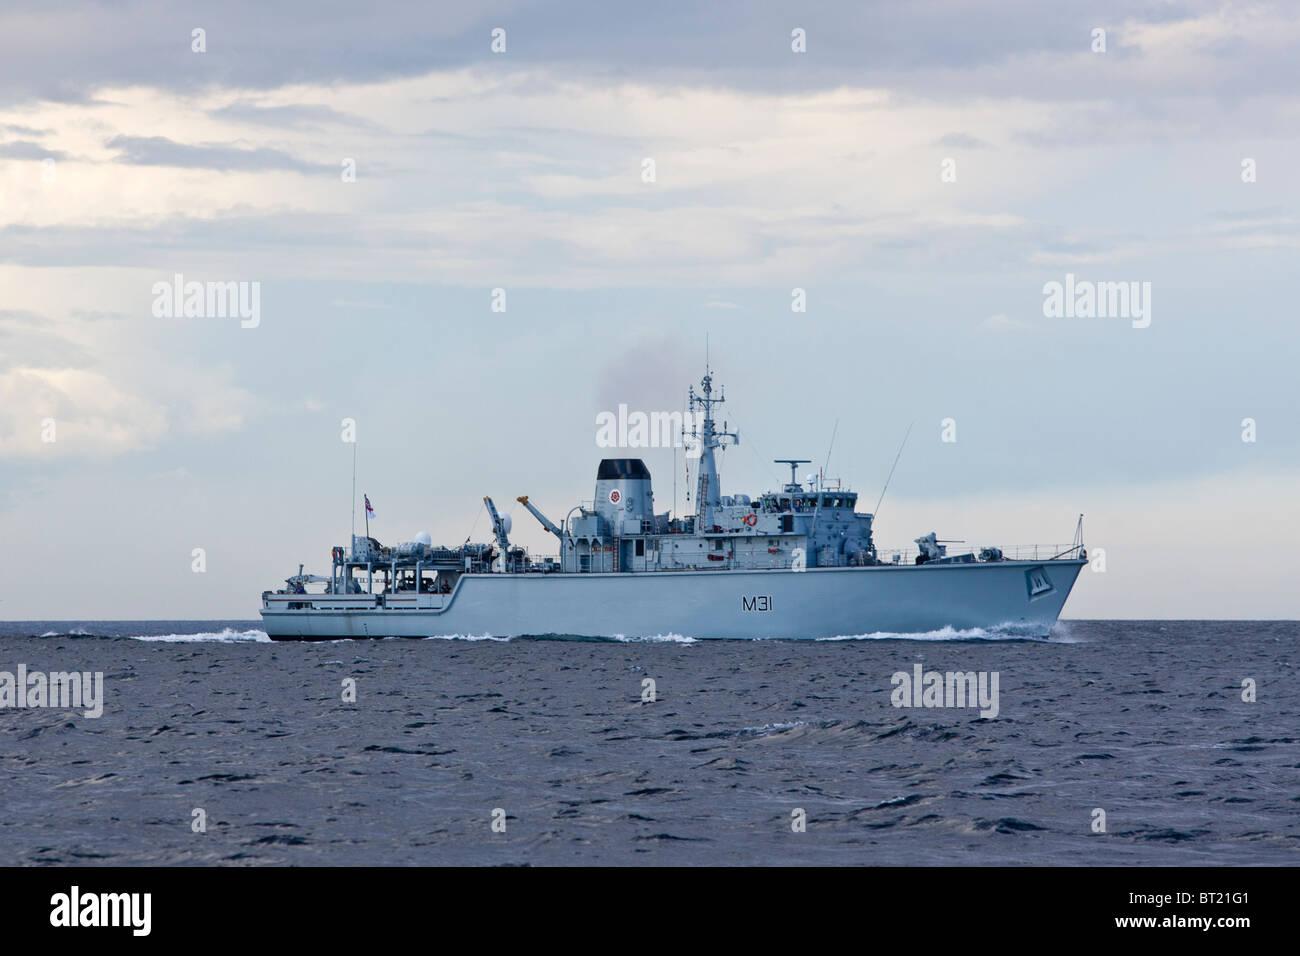 HMS Cattistock of Hartlepool, United Kingdom - Stock Image